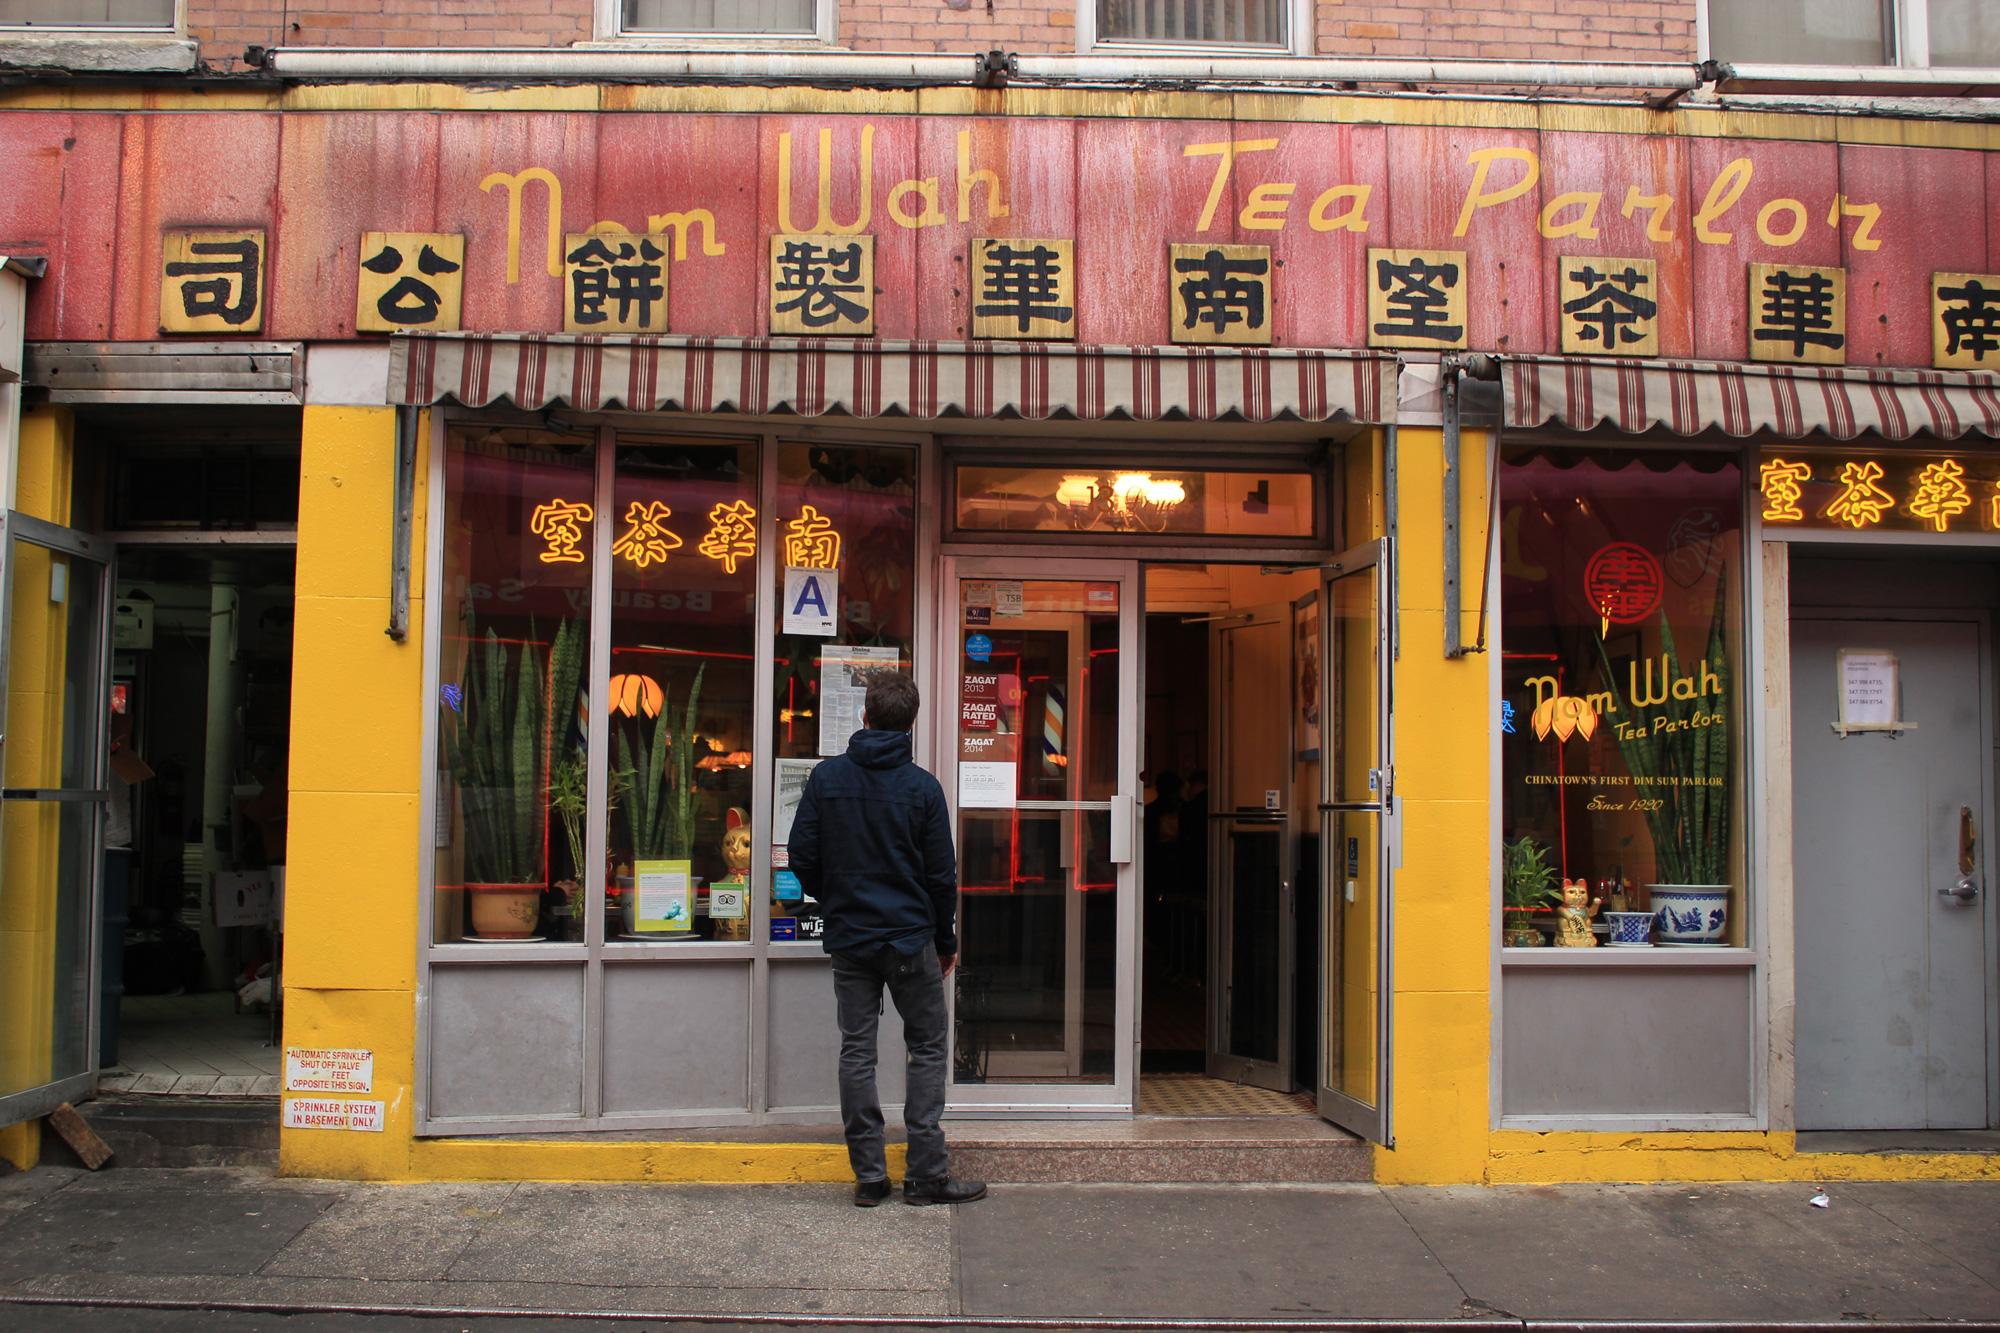 Nom Wah Tea Parlor | Best Restaurants in NYC's Chinatown